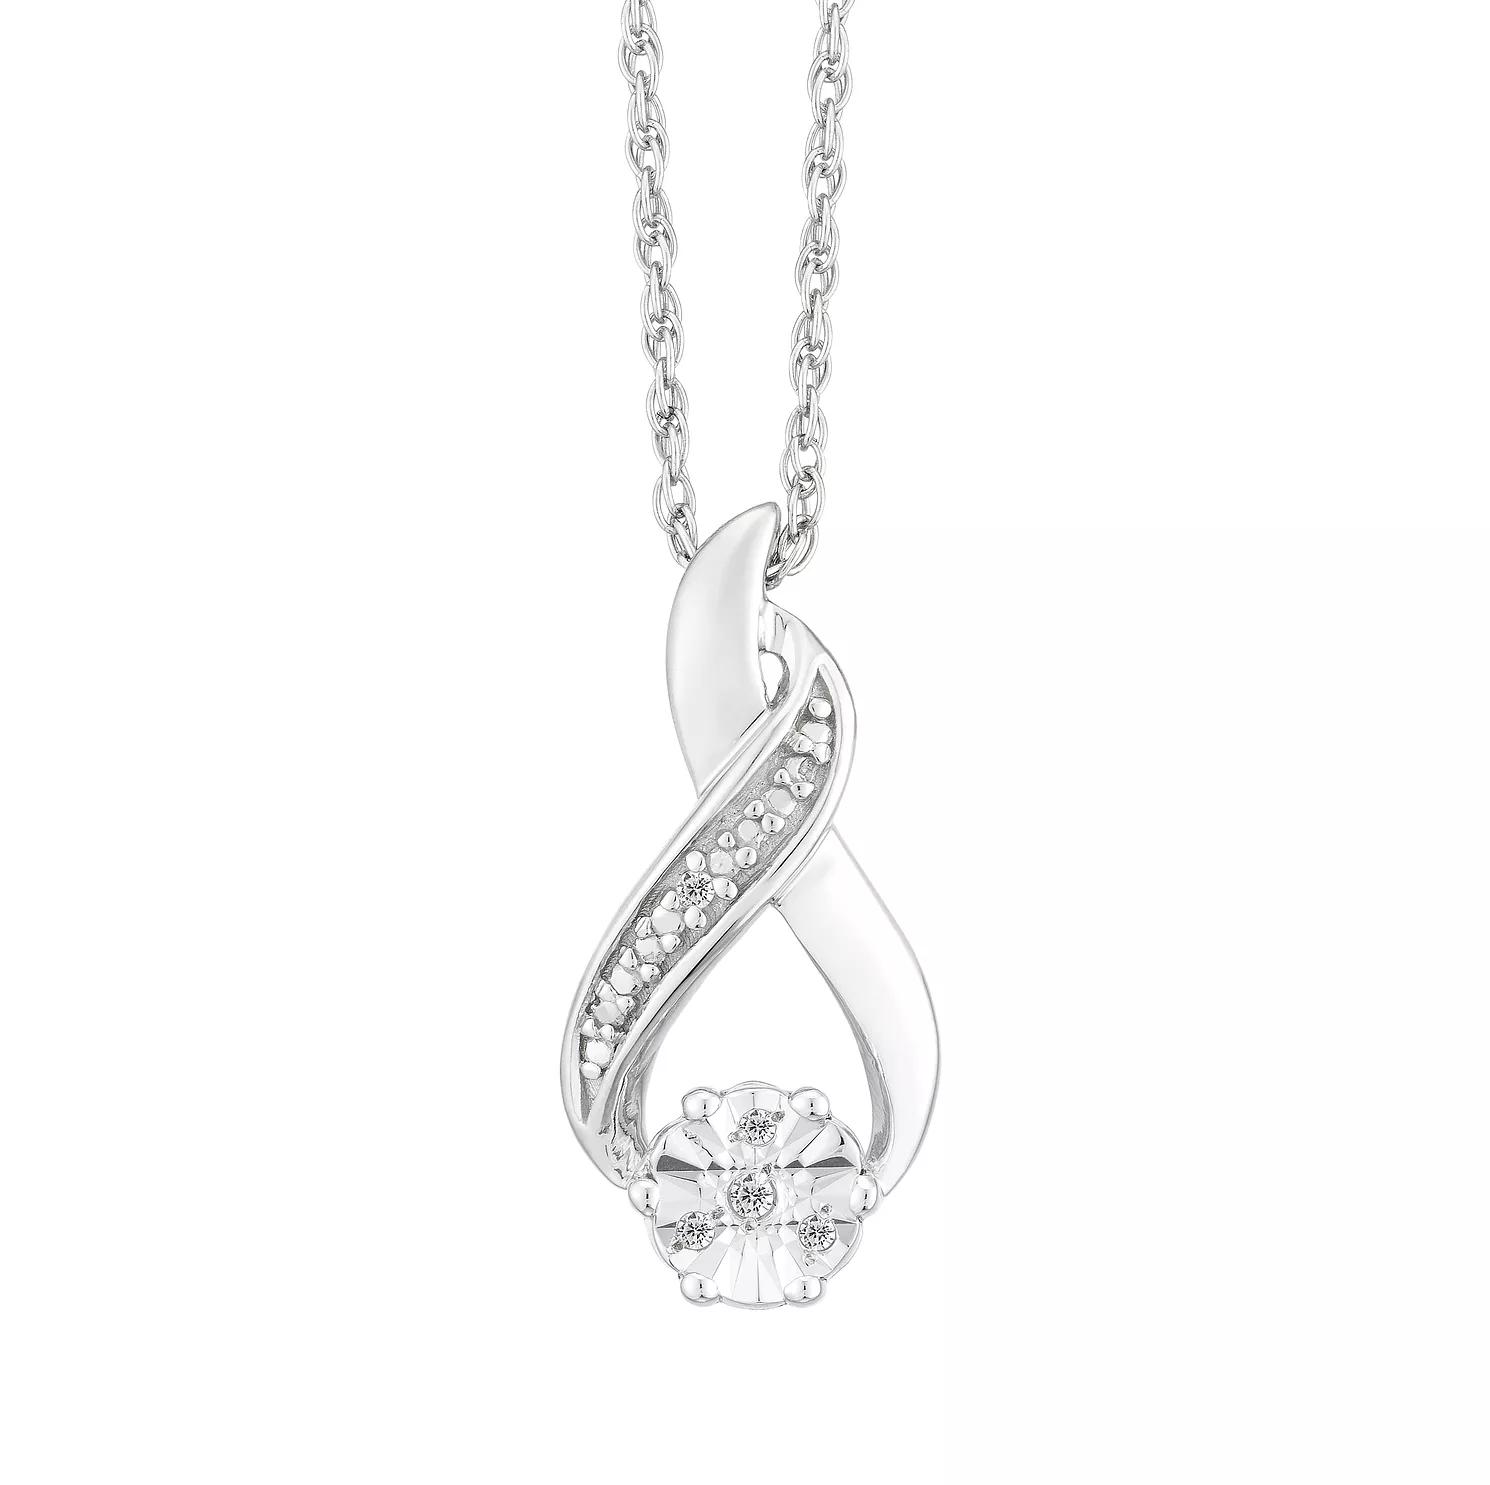 Infinity Necklace - H.Samuel